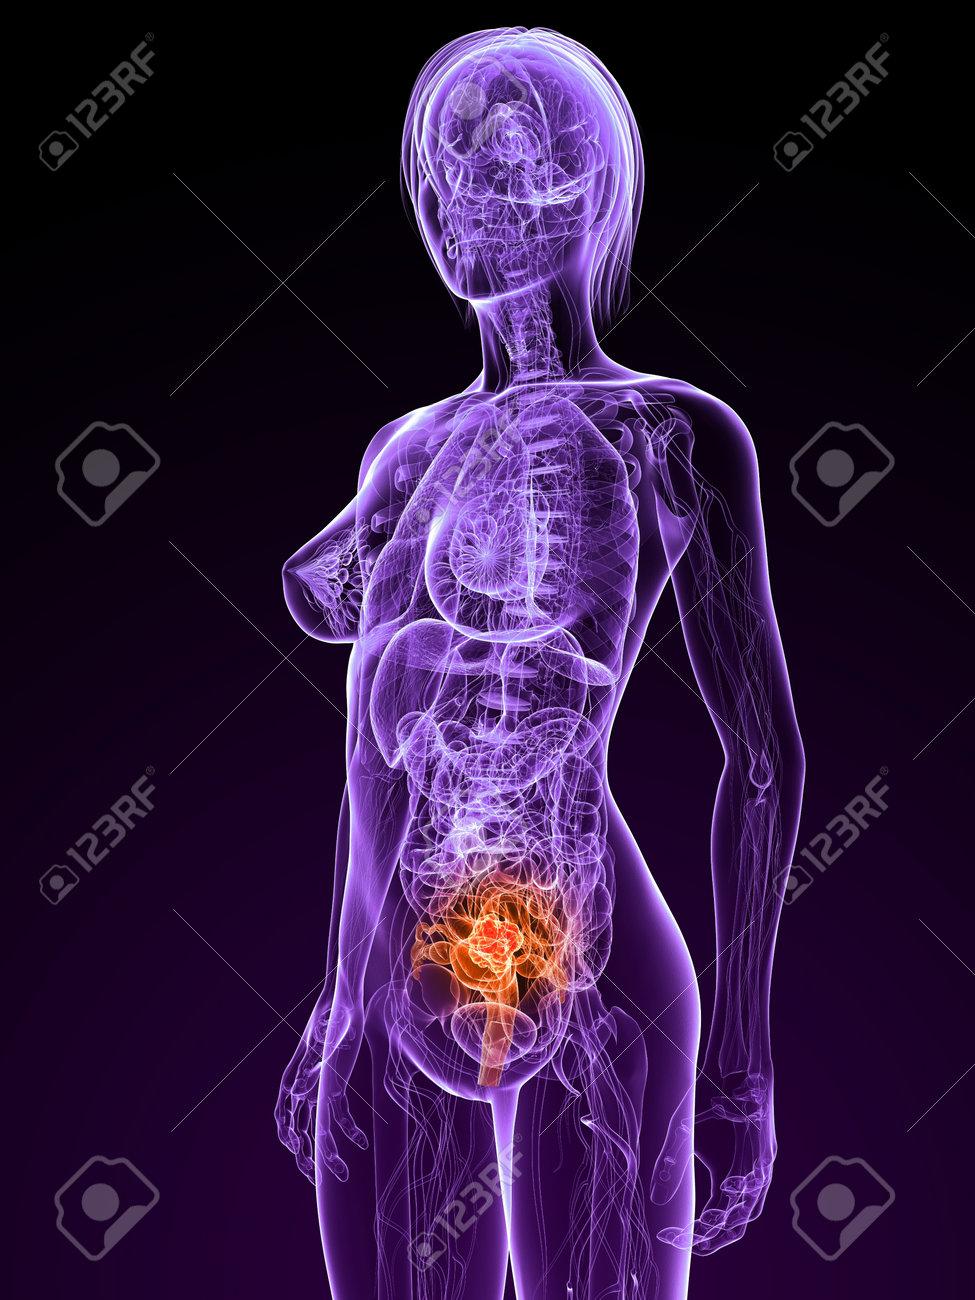 Transparent Female Anatomy With Tumor In Uterus Stock Photo Picture